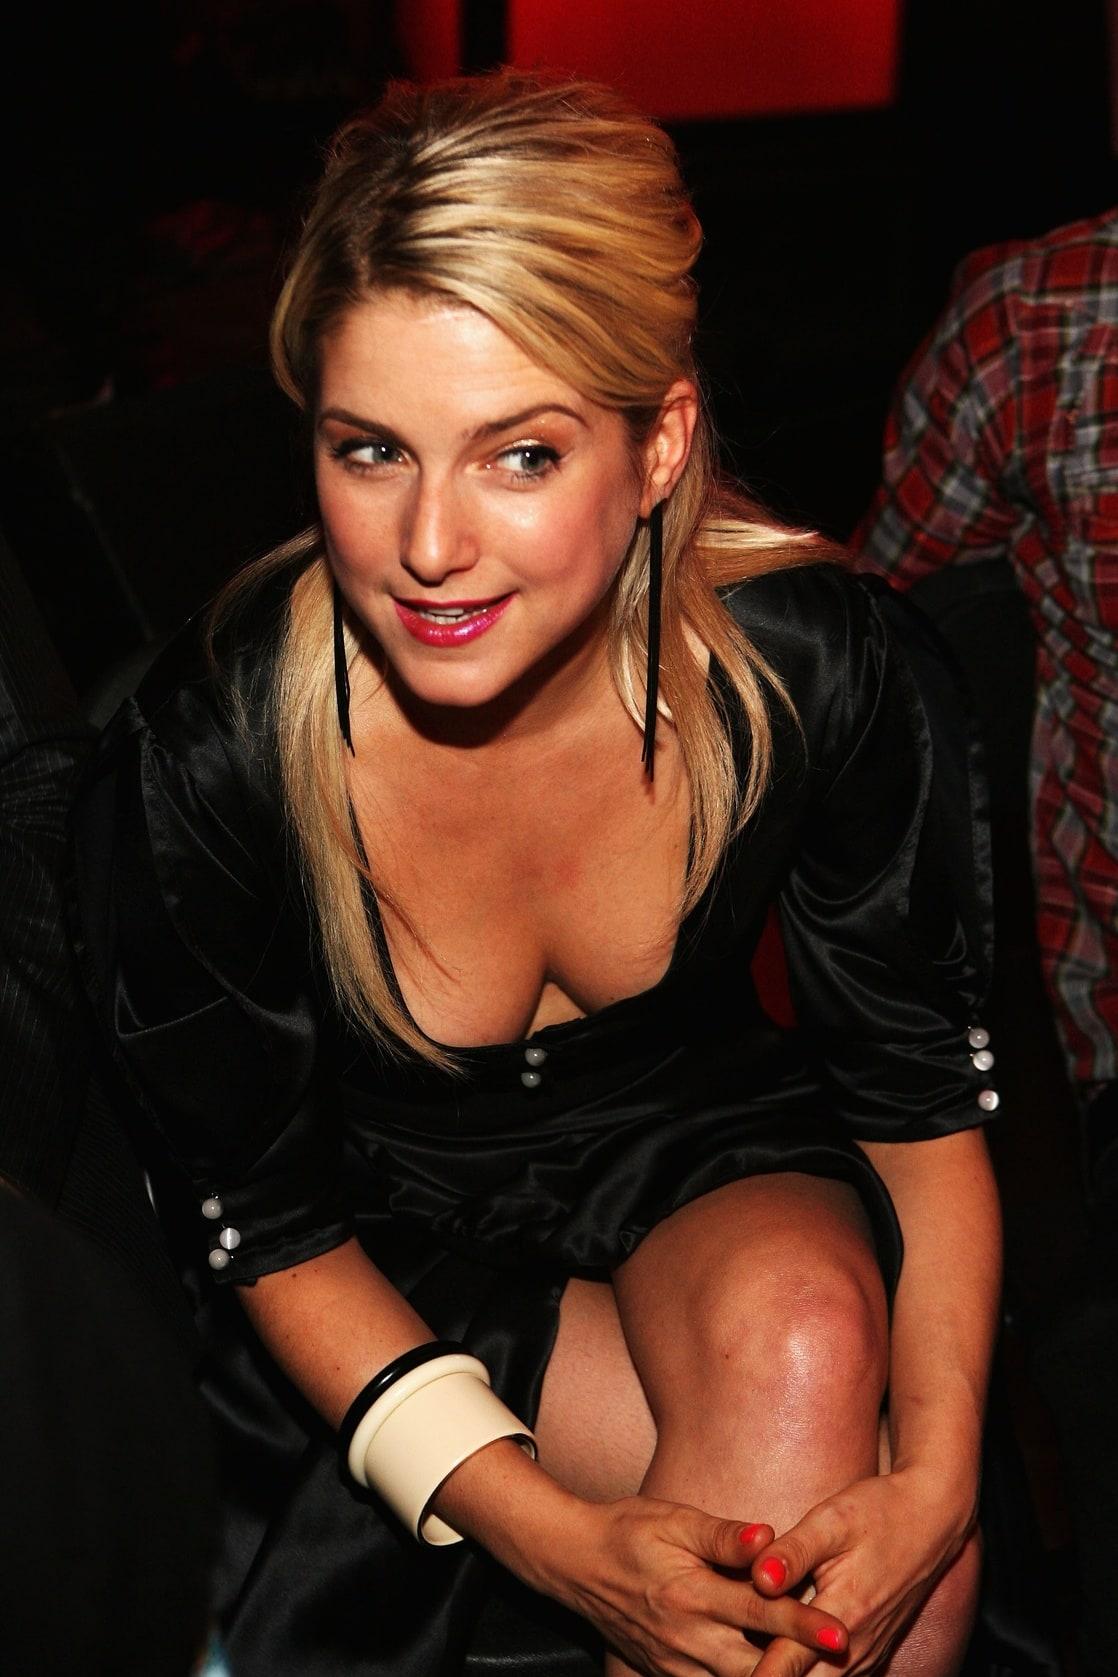 Nackt fake bilder jeanette biedermann pornos sexe girl